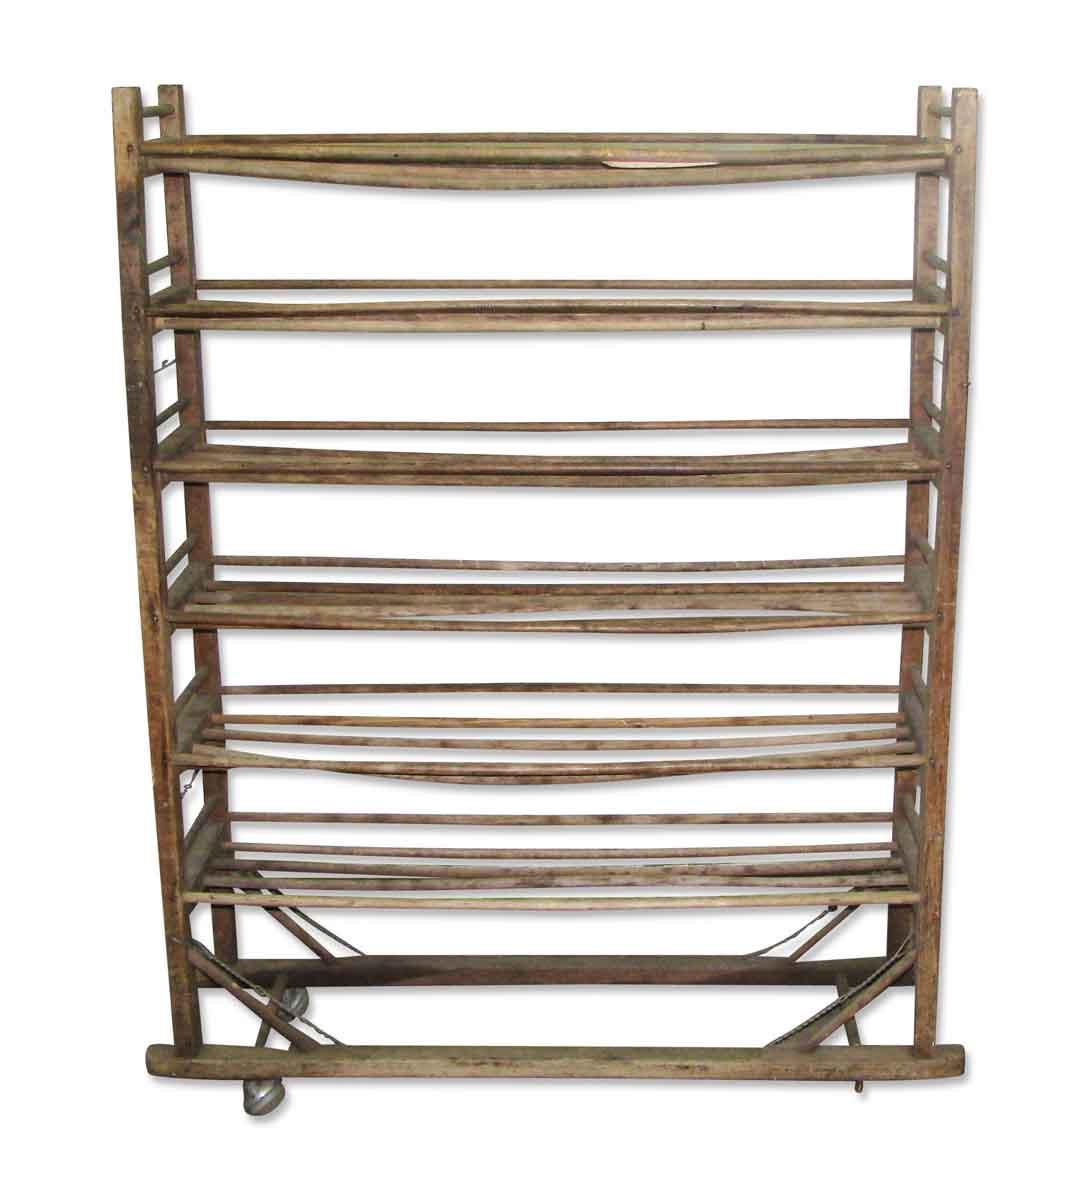 Design Wooden Shoe Rack wooden shoe rack on wheels olde good things wheels